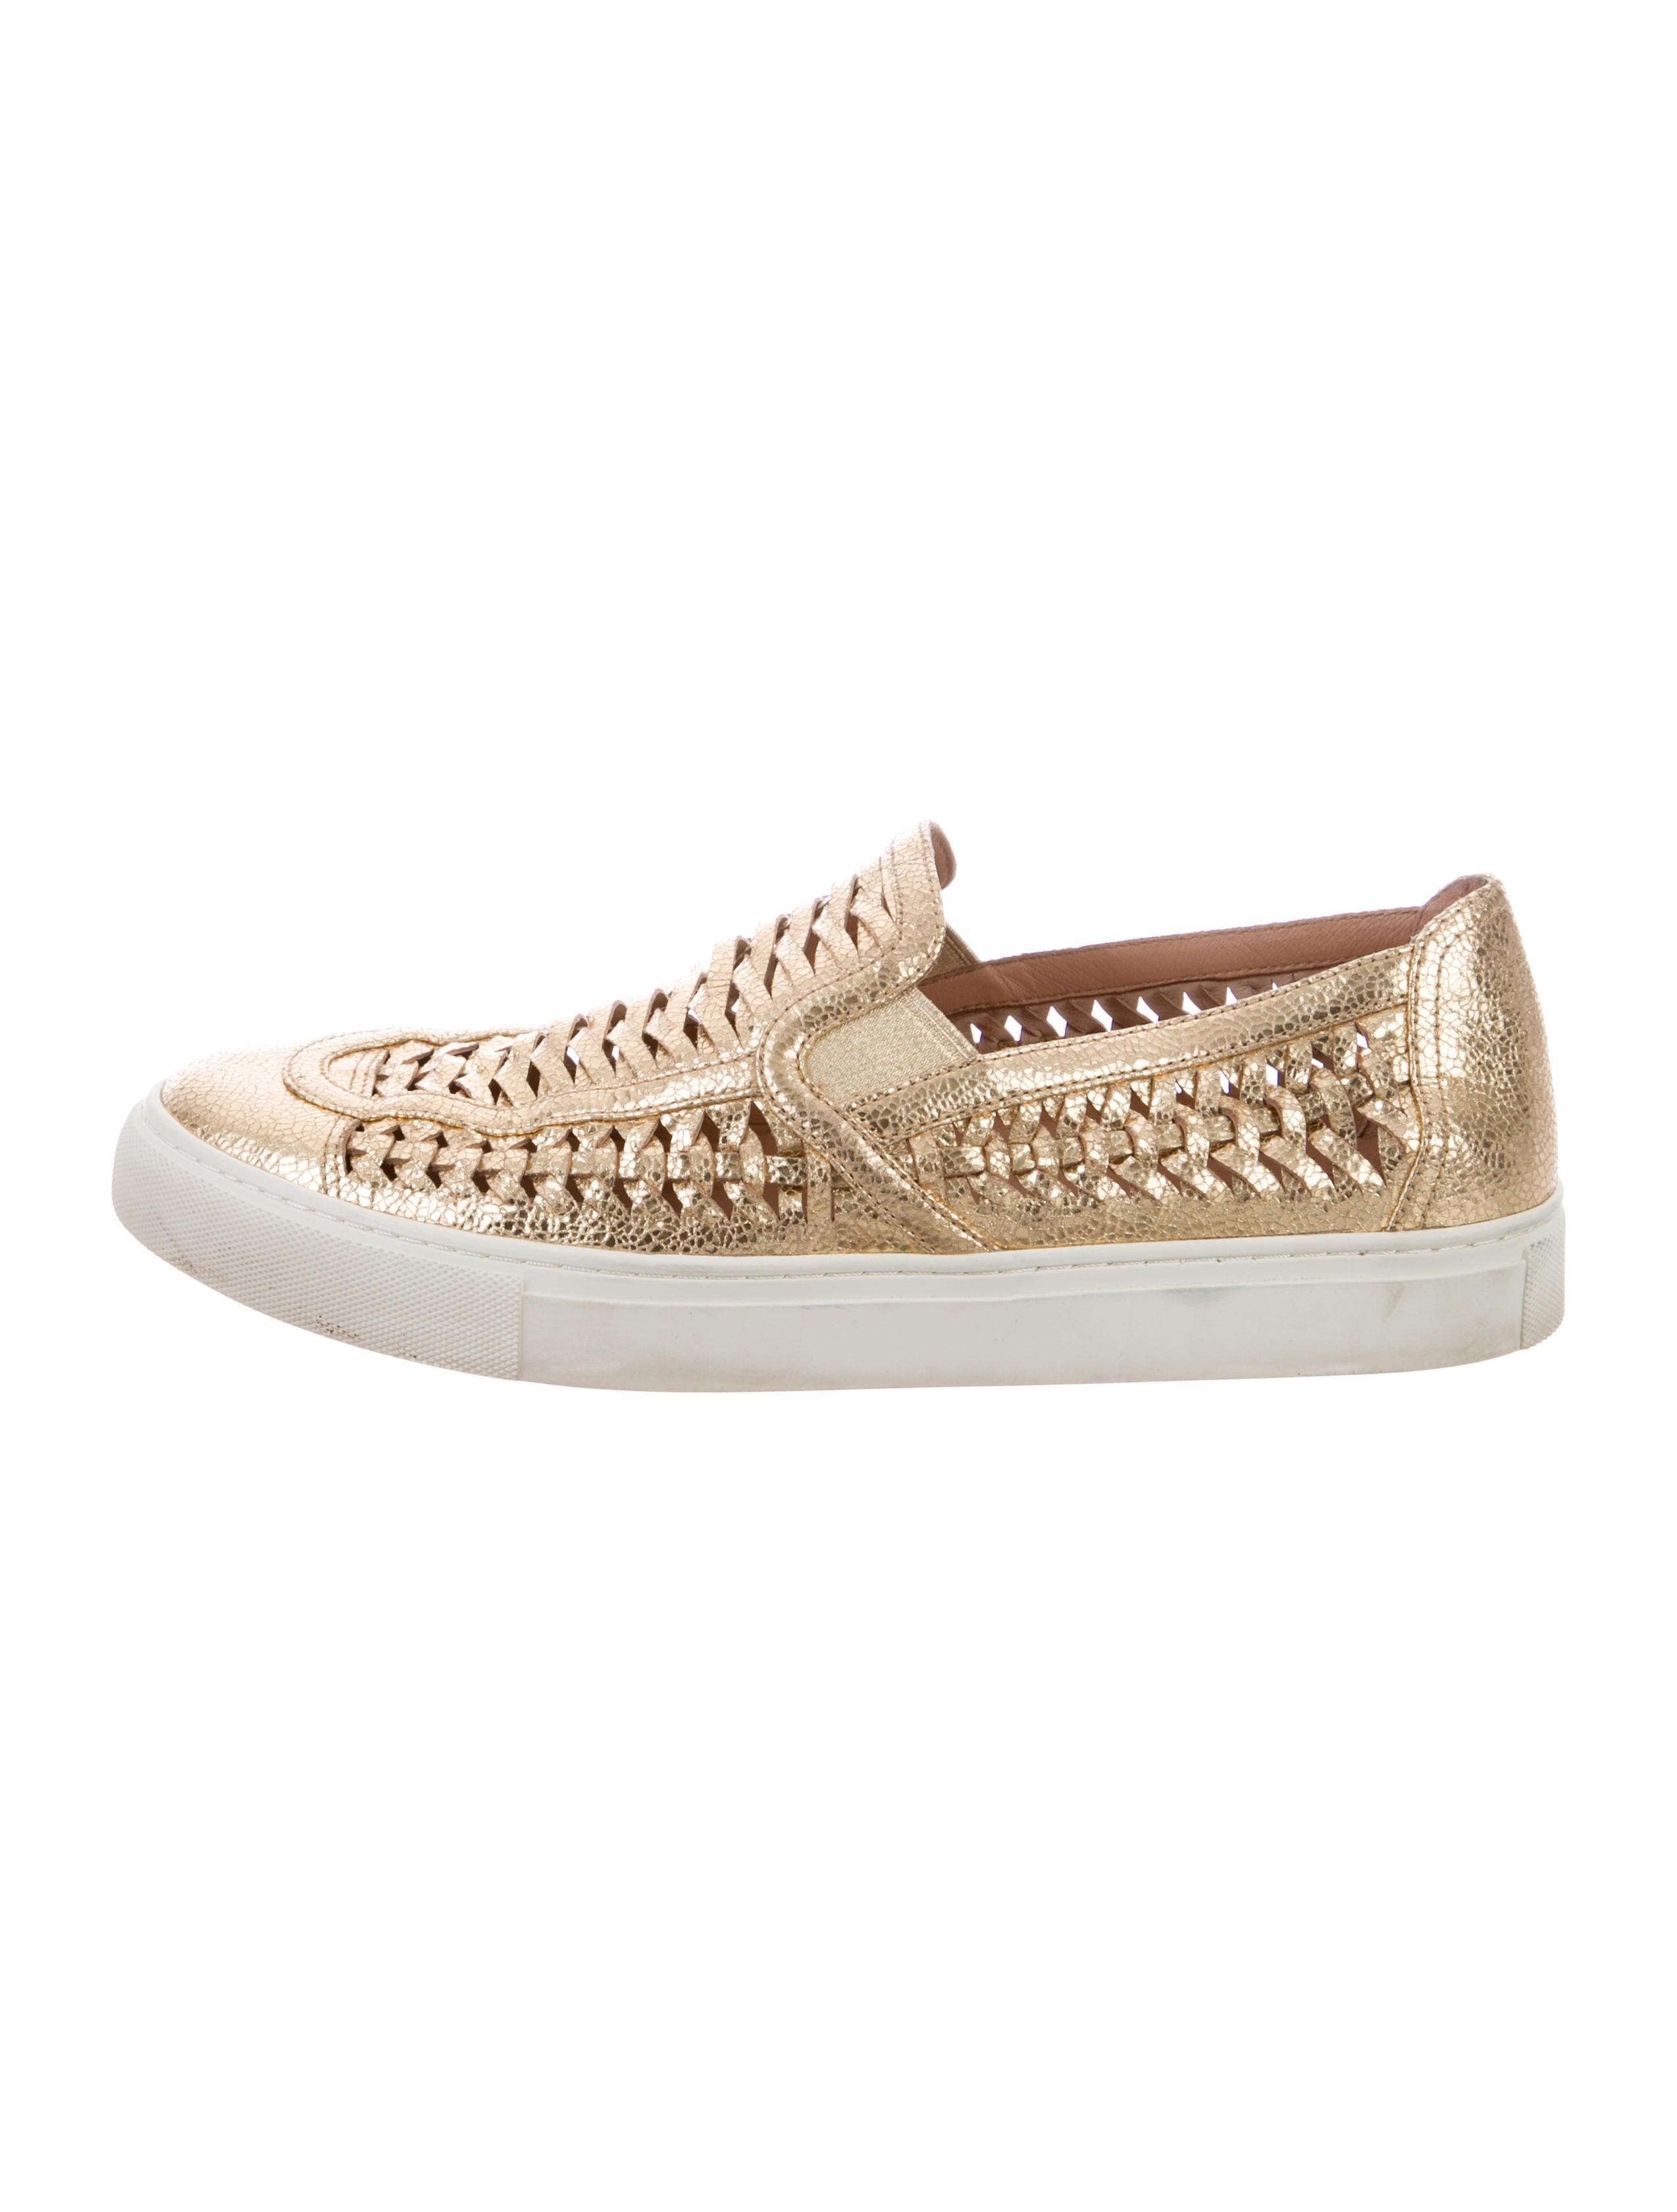 24ca99d05707 Tory Burch Huarache Slip-On Sneakers - Shoes - WTO166810